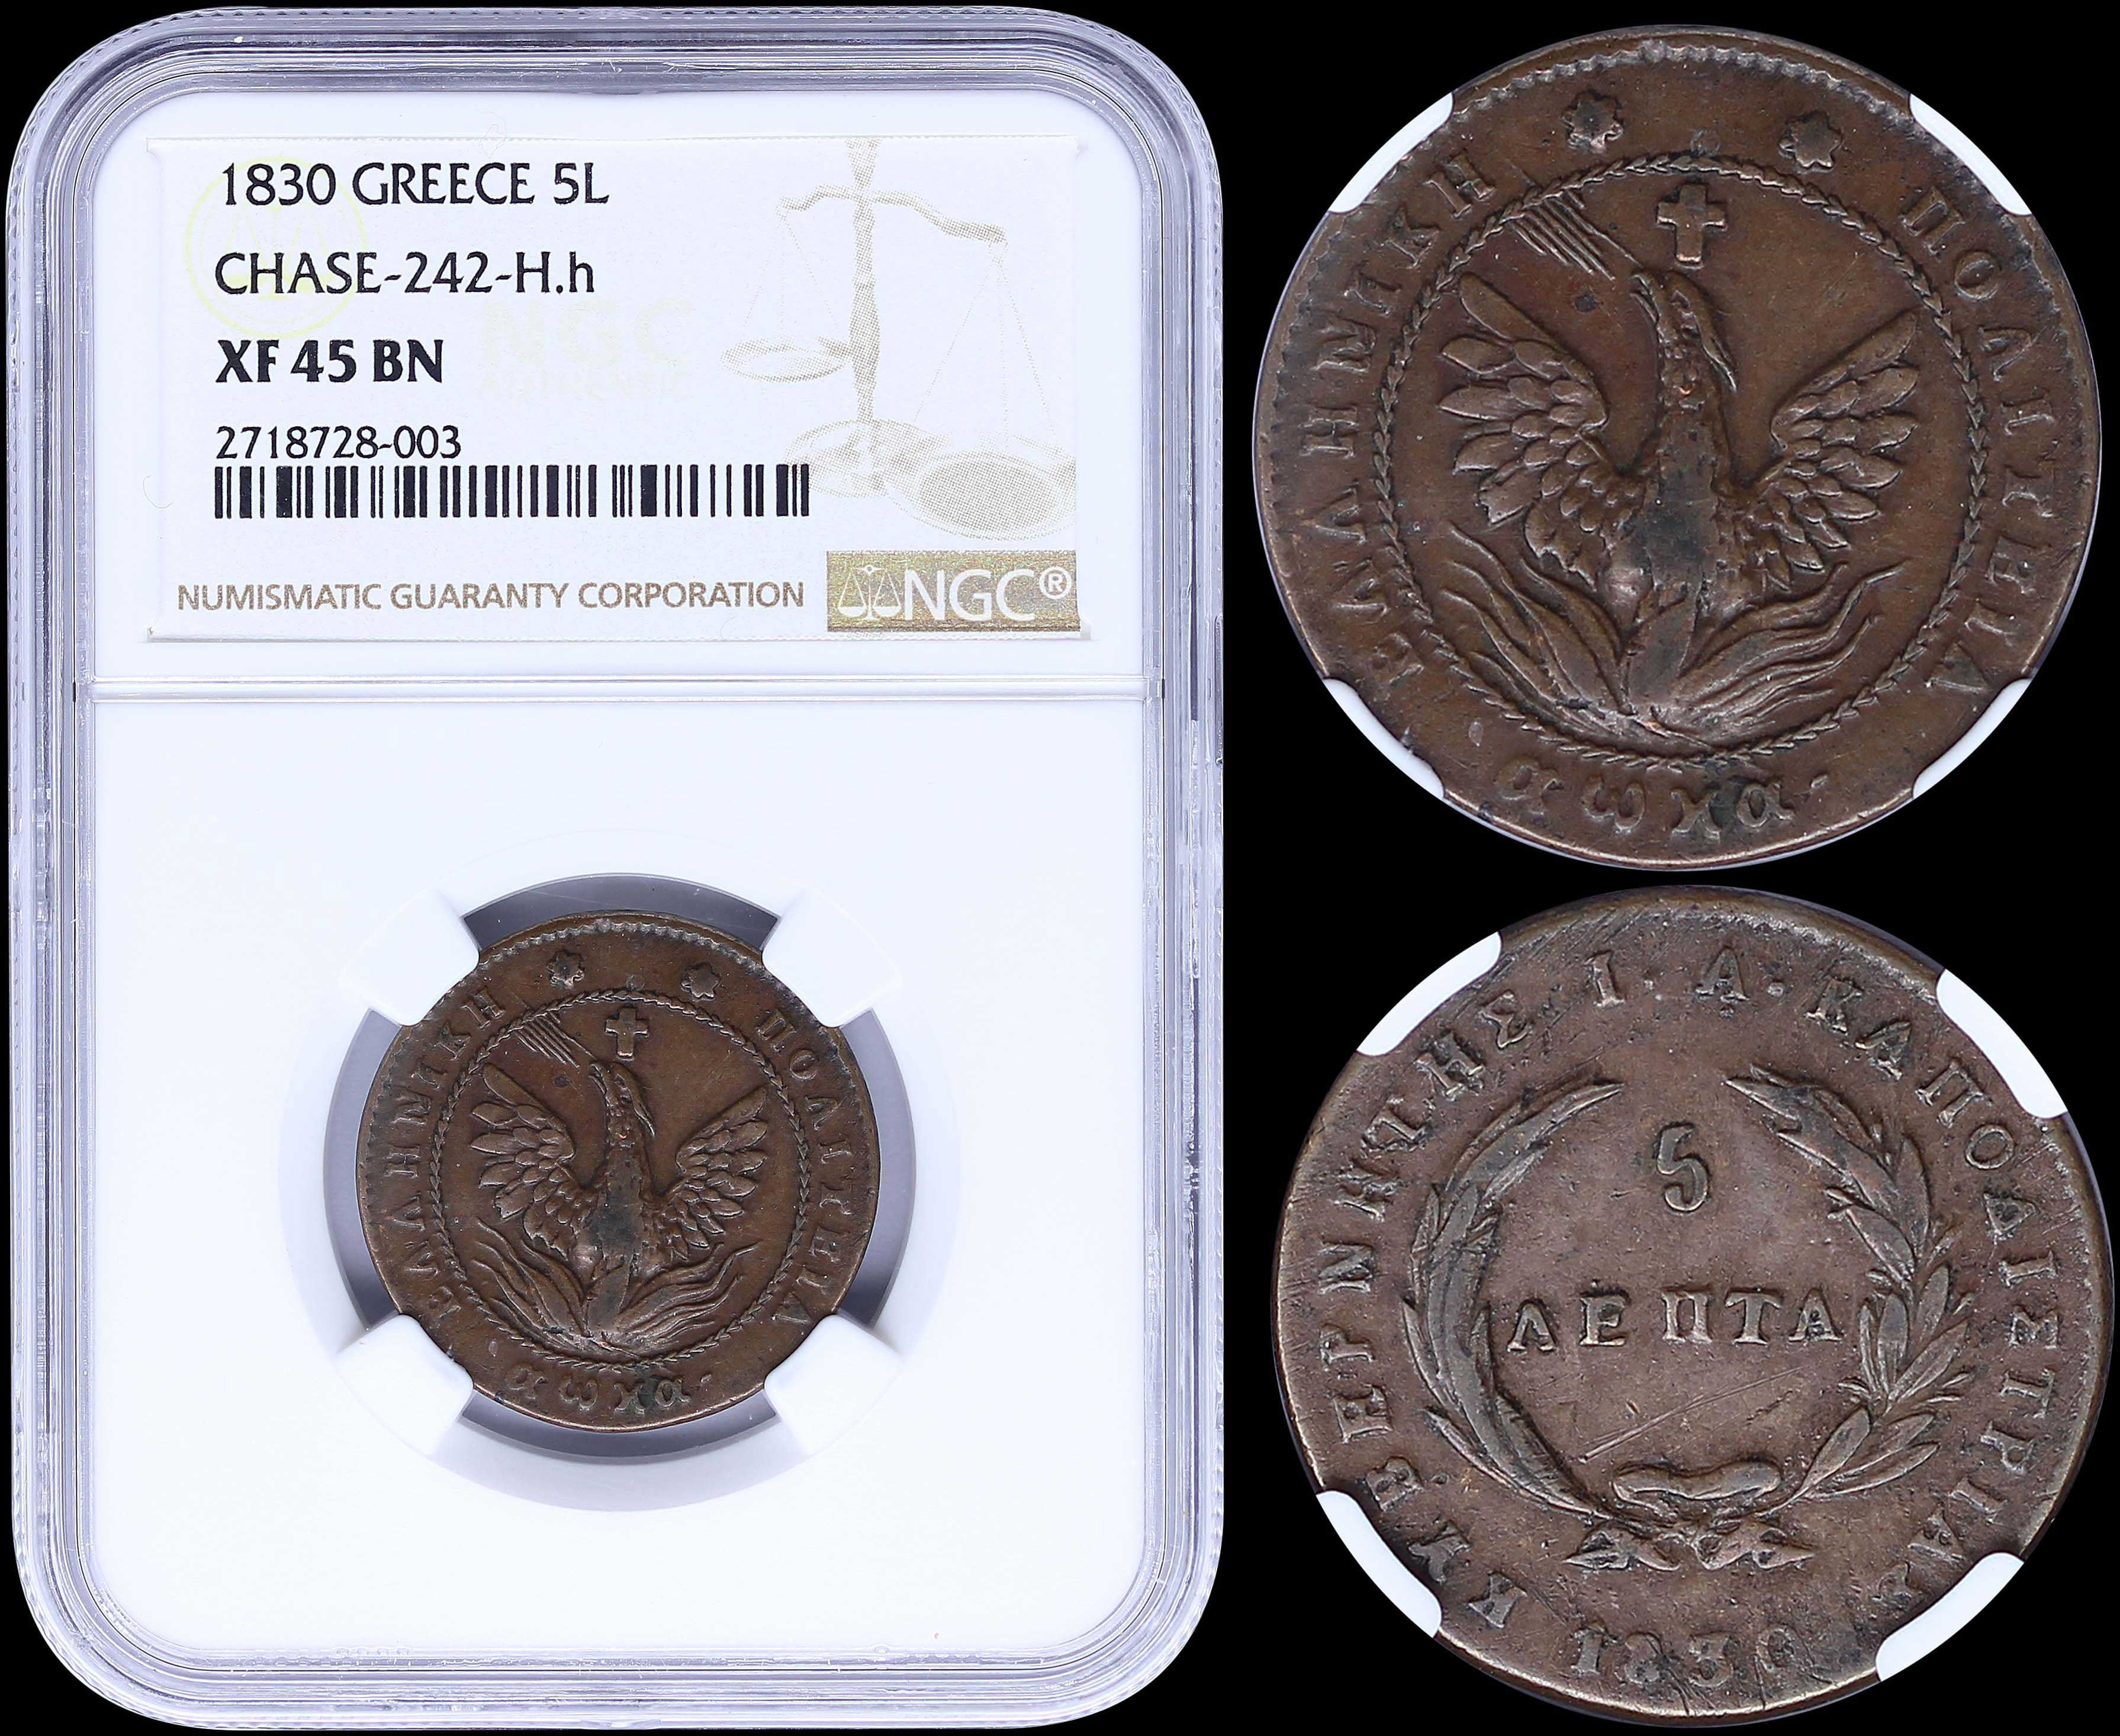 Lot 8025 - -  COINS & TOKENS governor capodistrias -  A. Karamitsos Public & Live Bid Auction 649 Coins, Medals & Banknotes